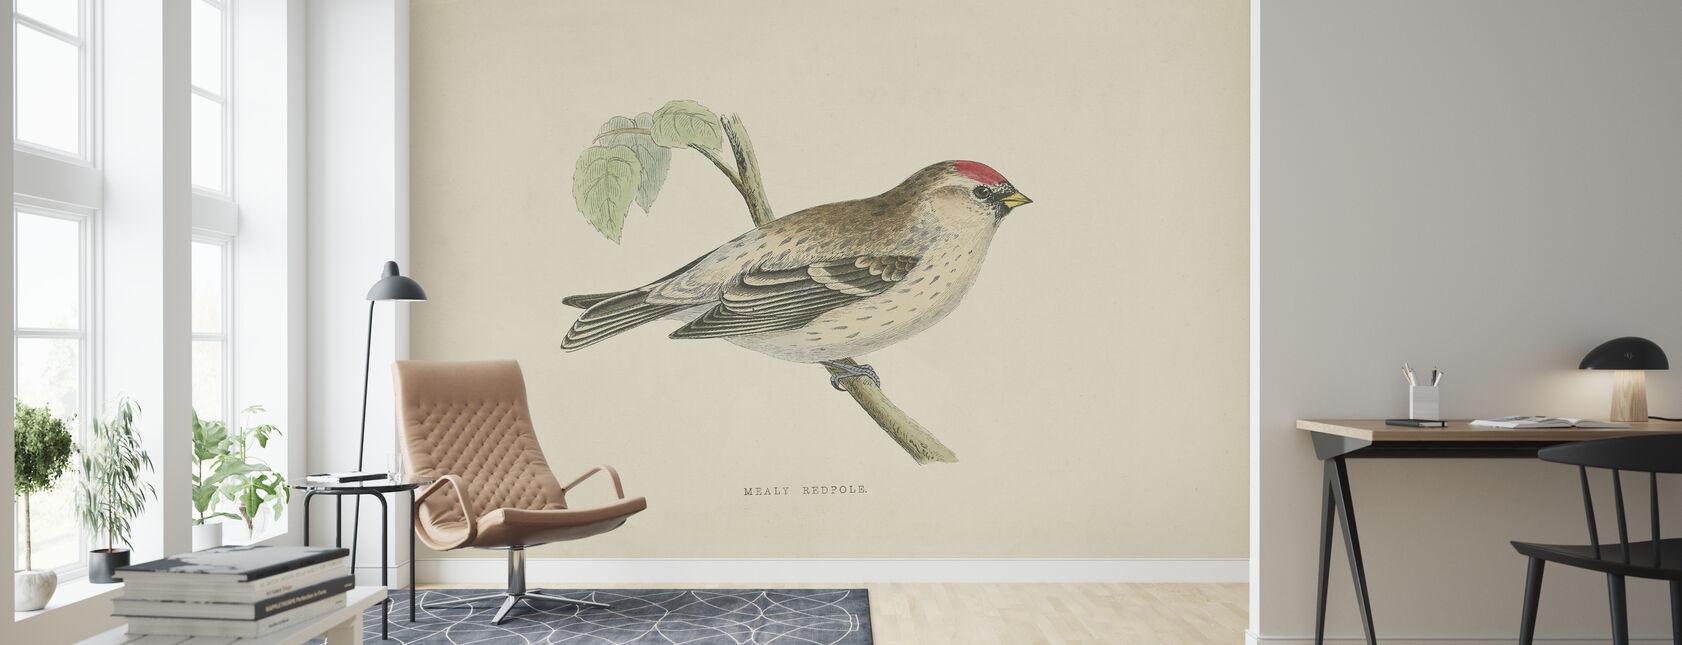 Mealy Redpole Print - Wallpaper - Living Room